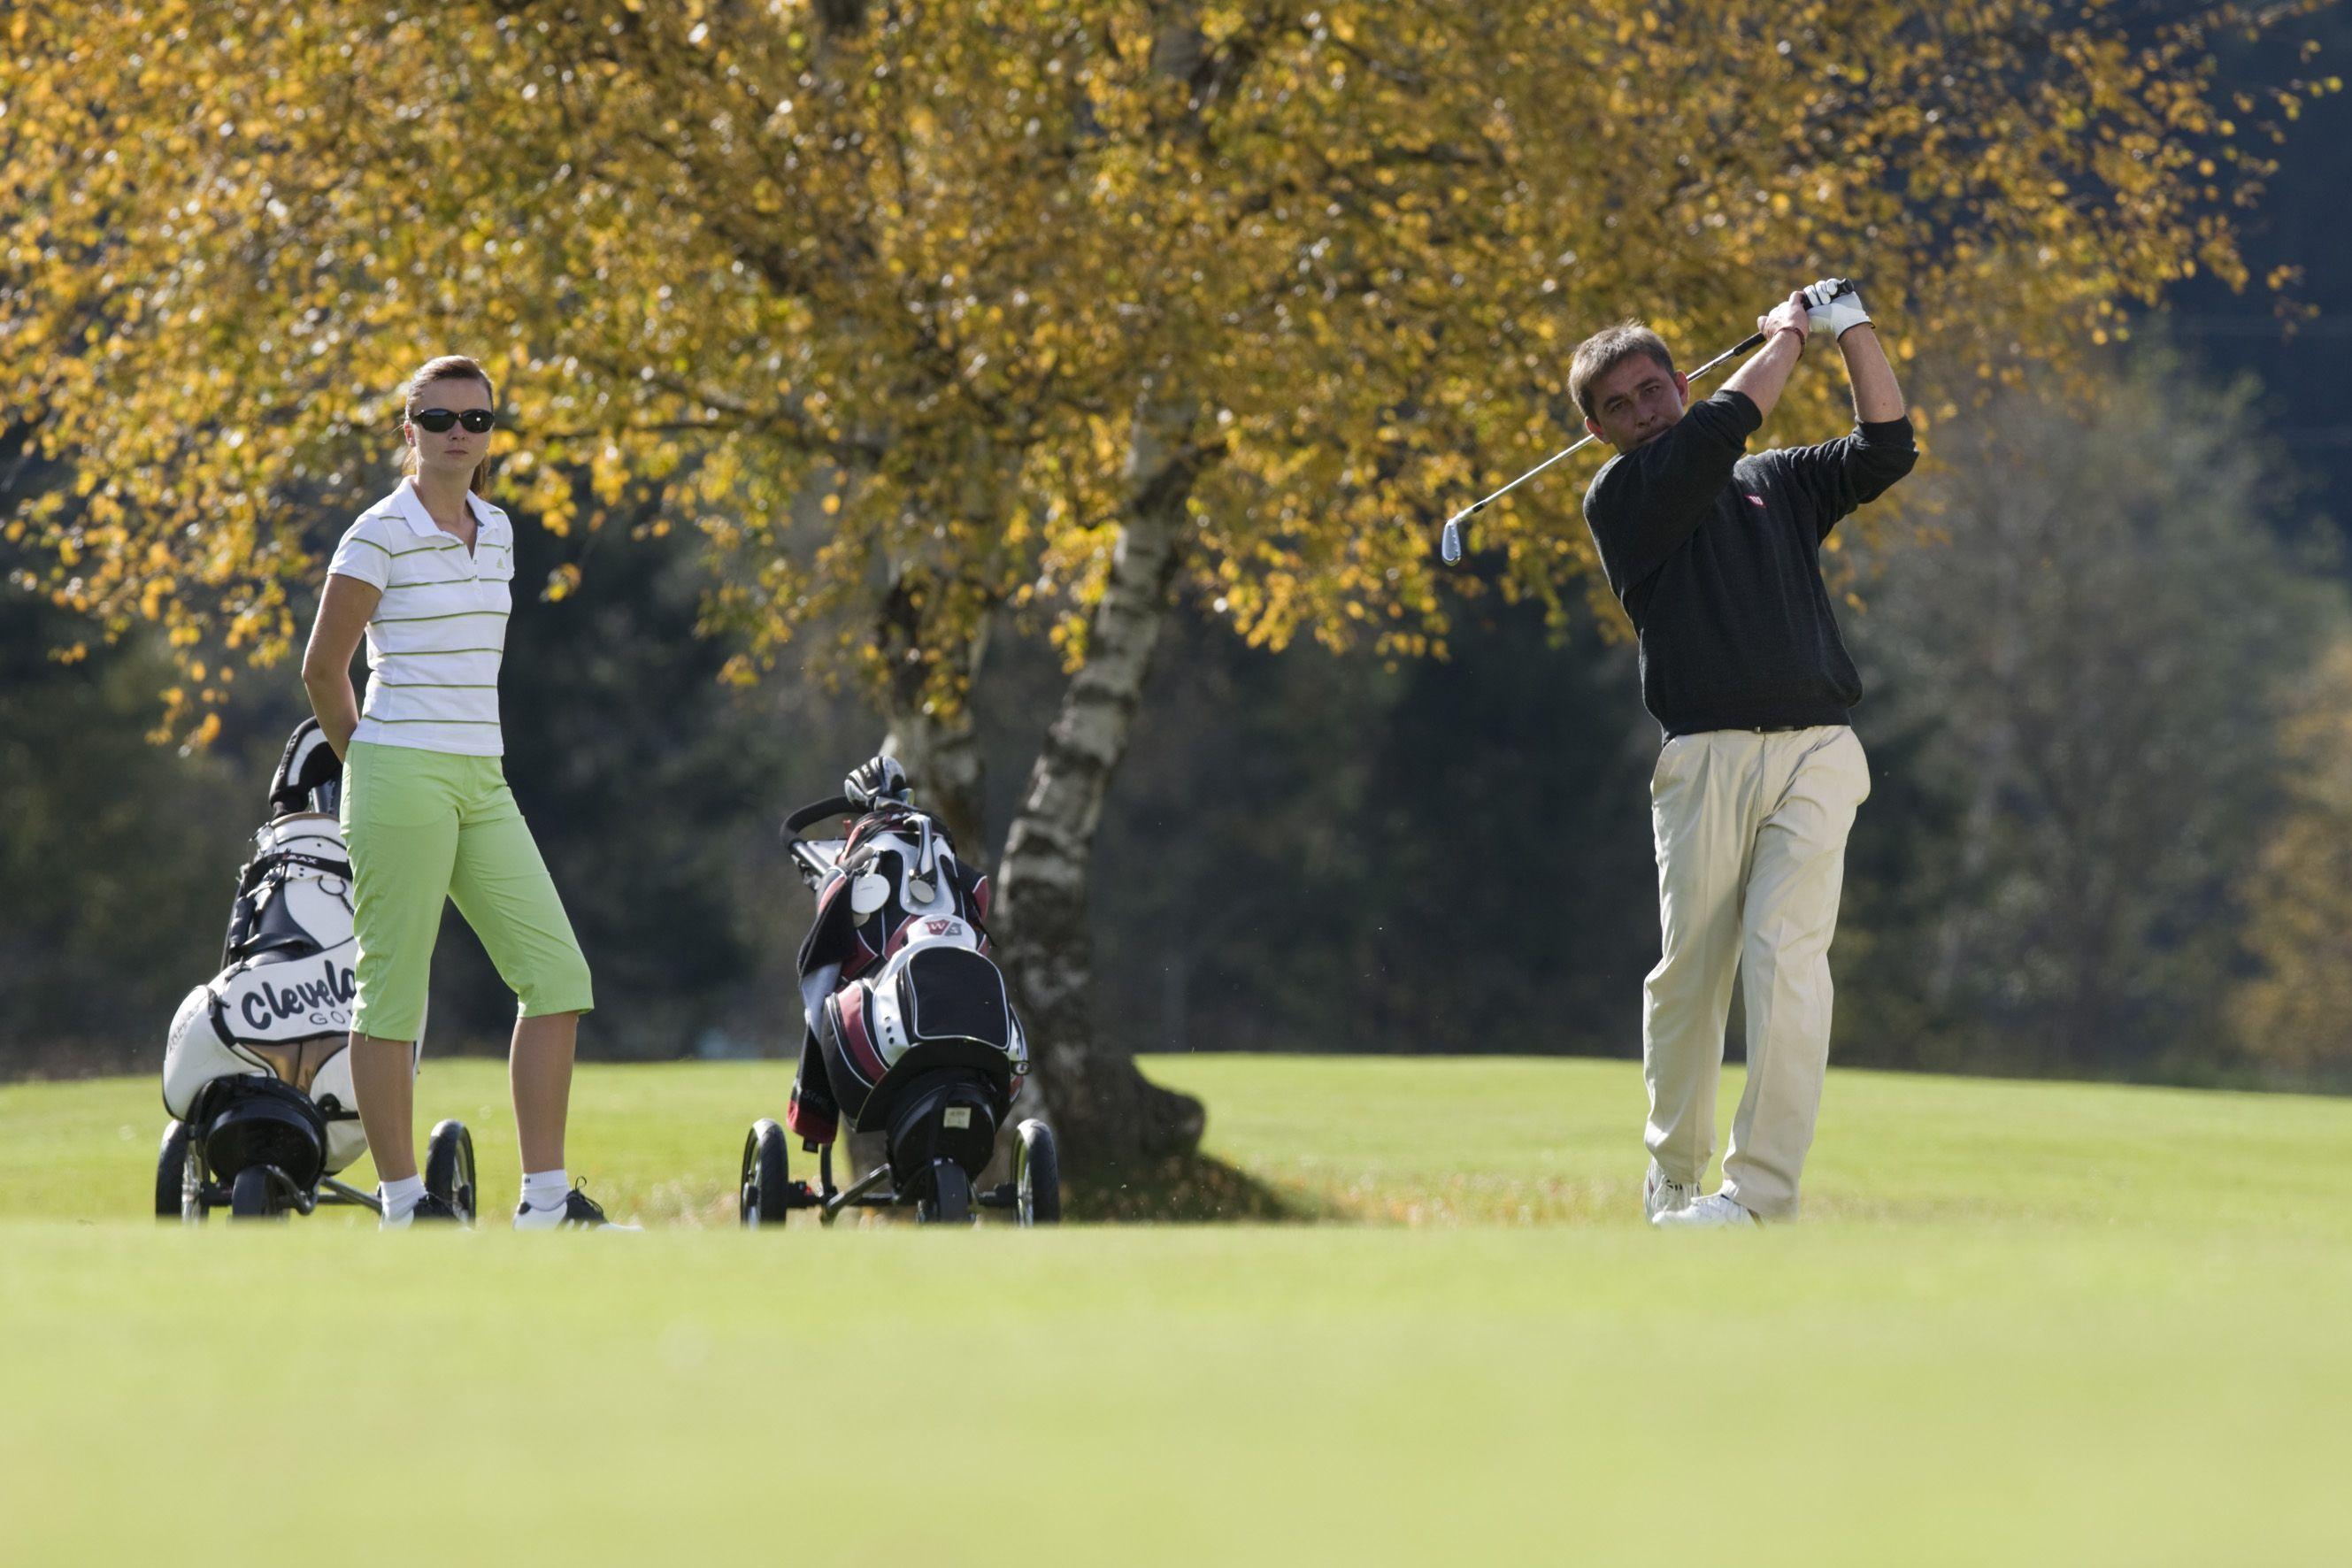 golfplatz-lungau_tvb-st-michael_32958610